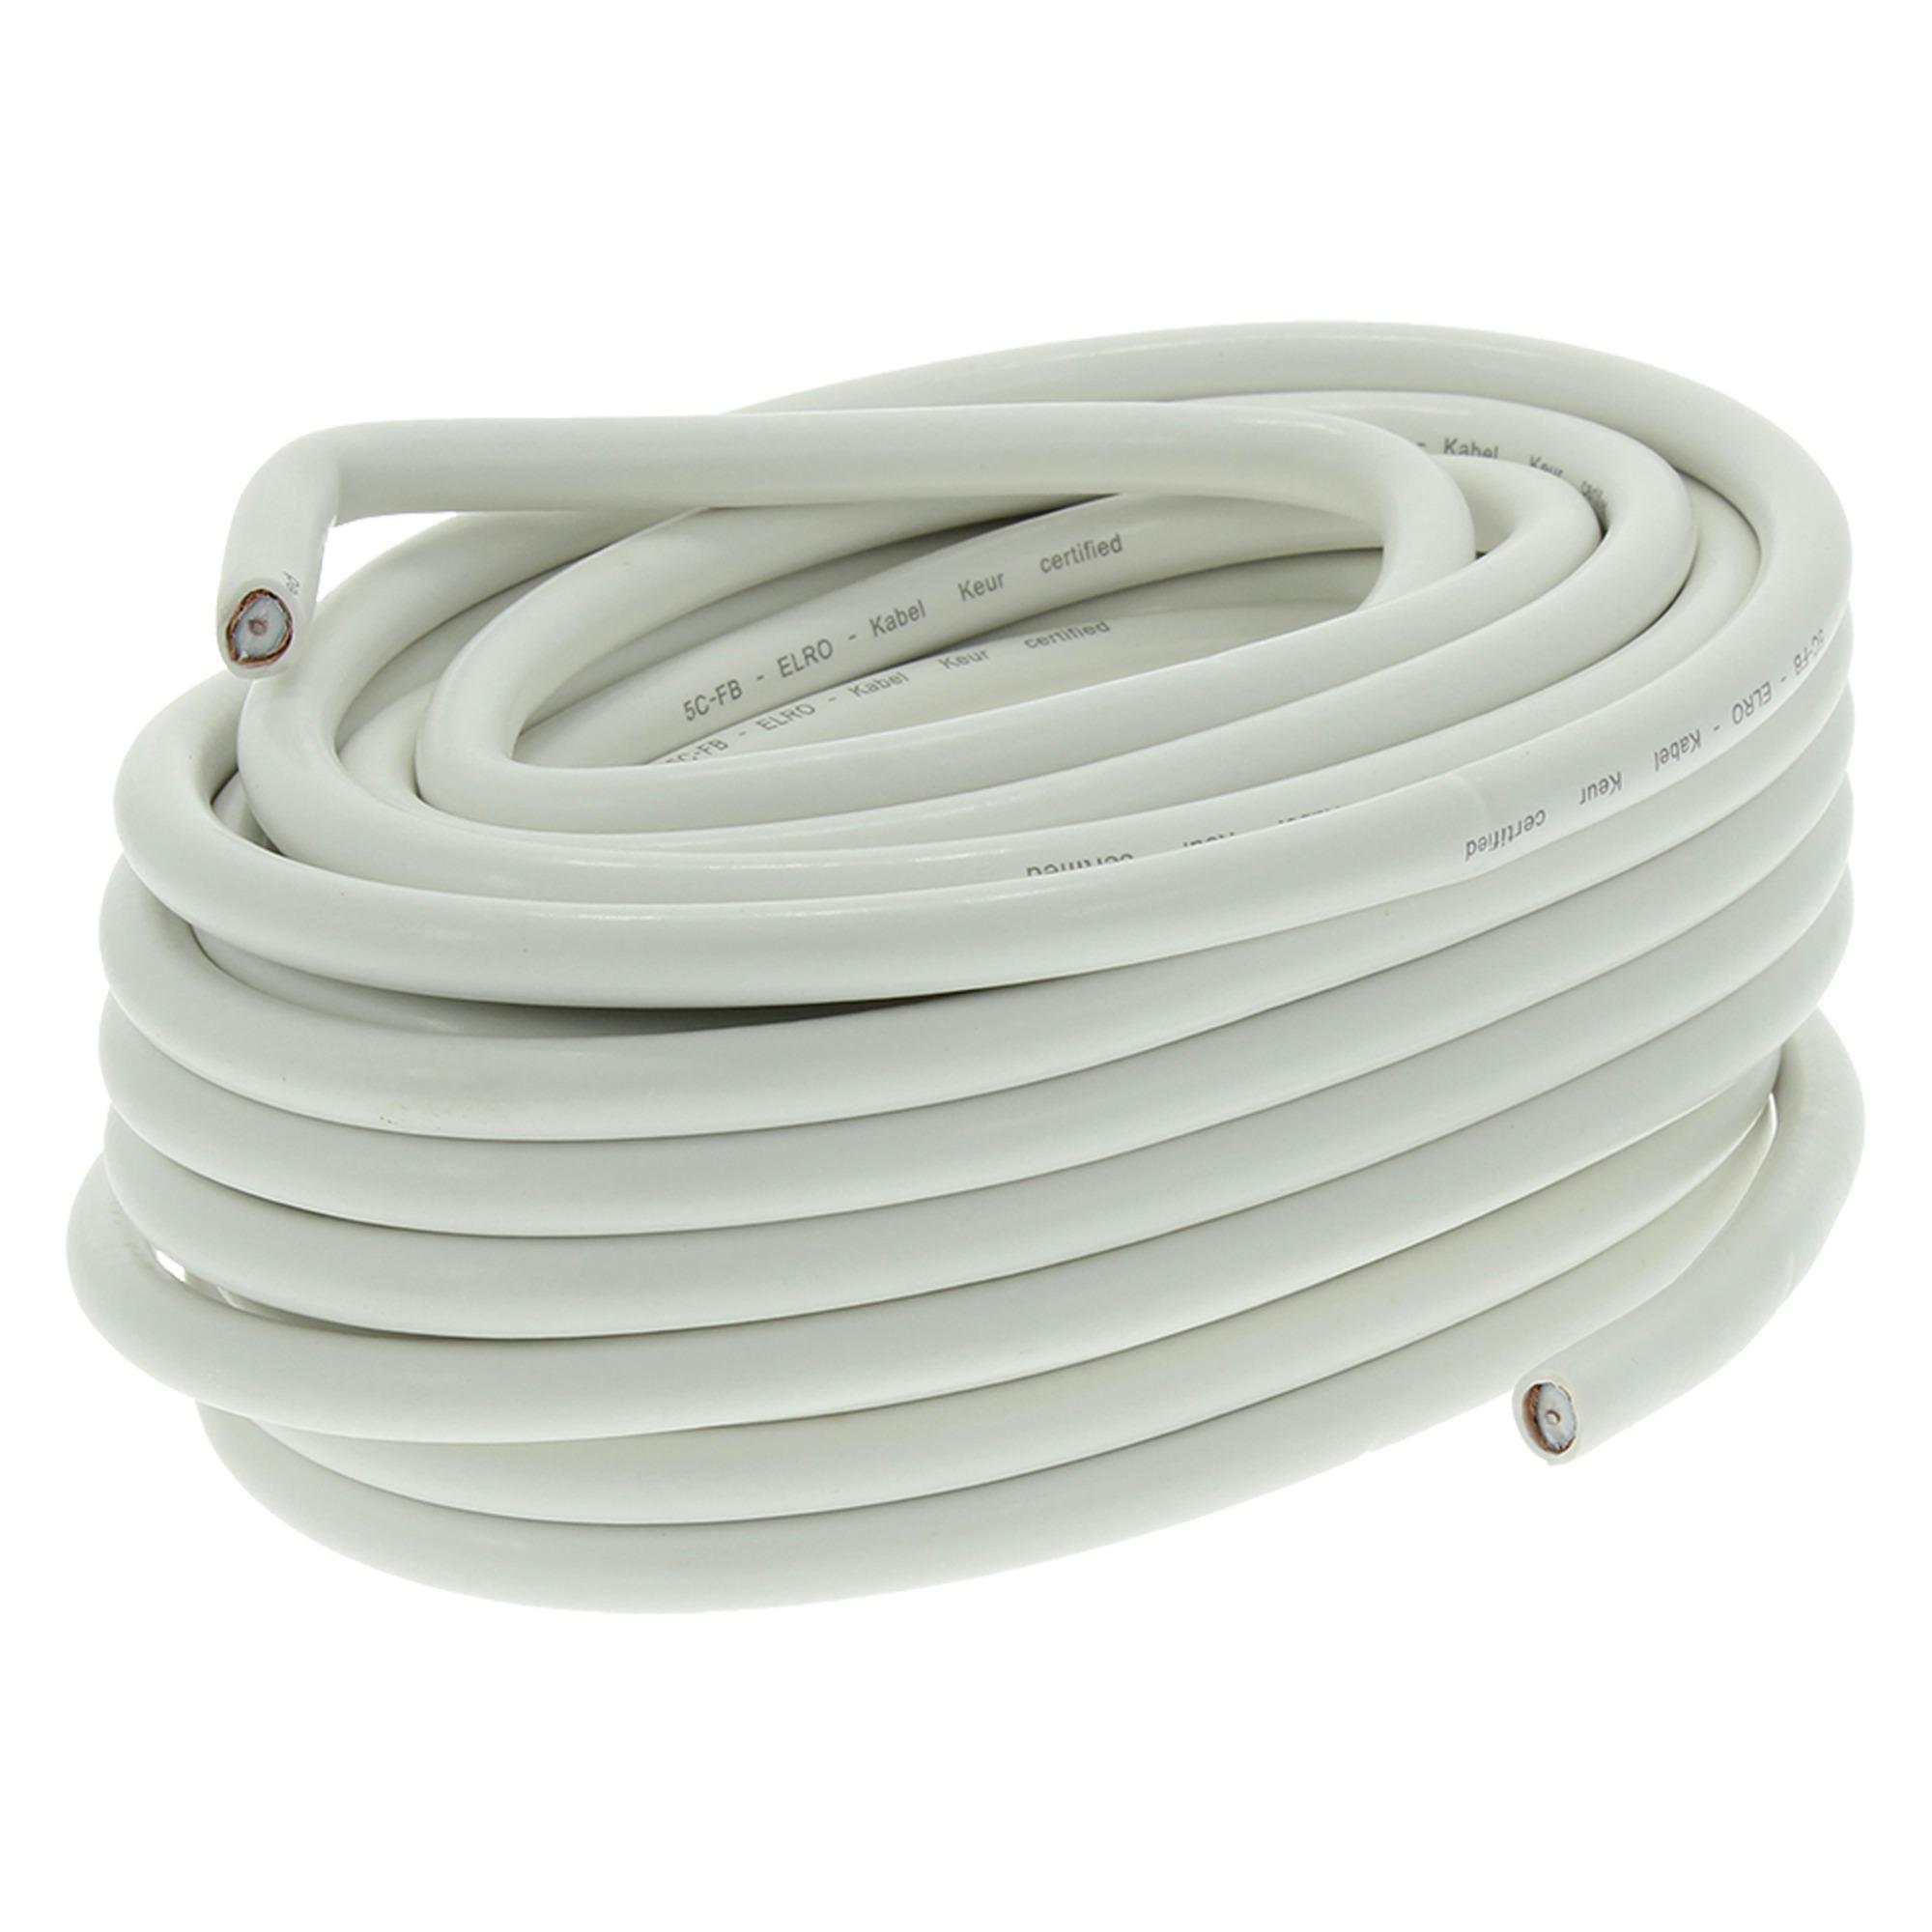 Q-Link coax kabel RG59 50 meter wit